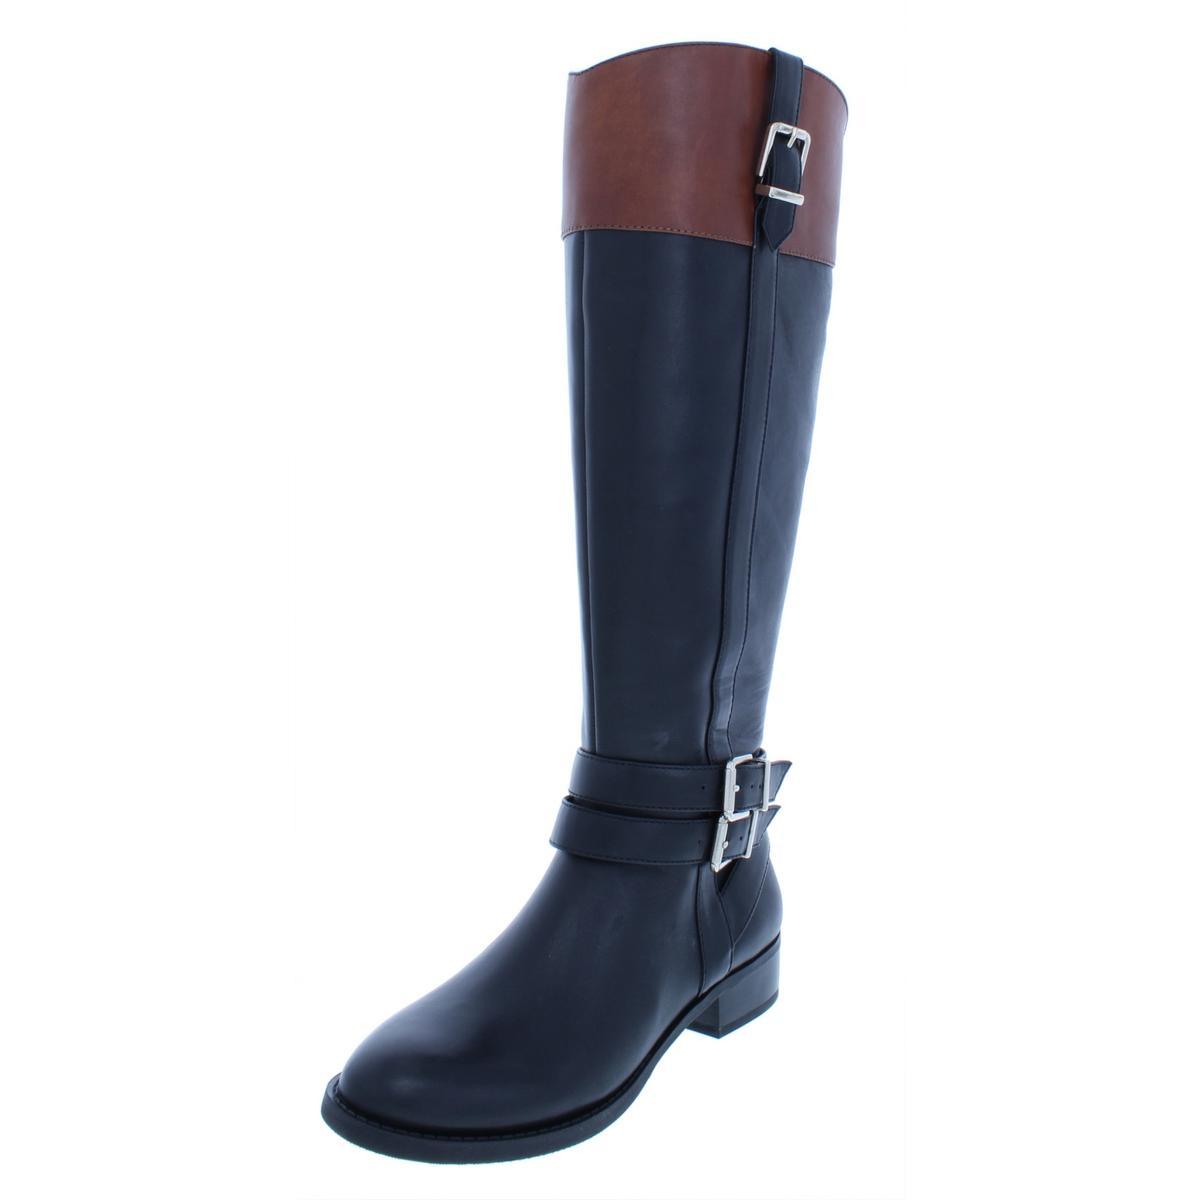 INC Damenschuhe Frank II Leder Wide Calf Over-The-Knee Riding Schuhes Stiefel Schuhes Riding BHFO 5125 b8ec37